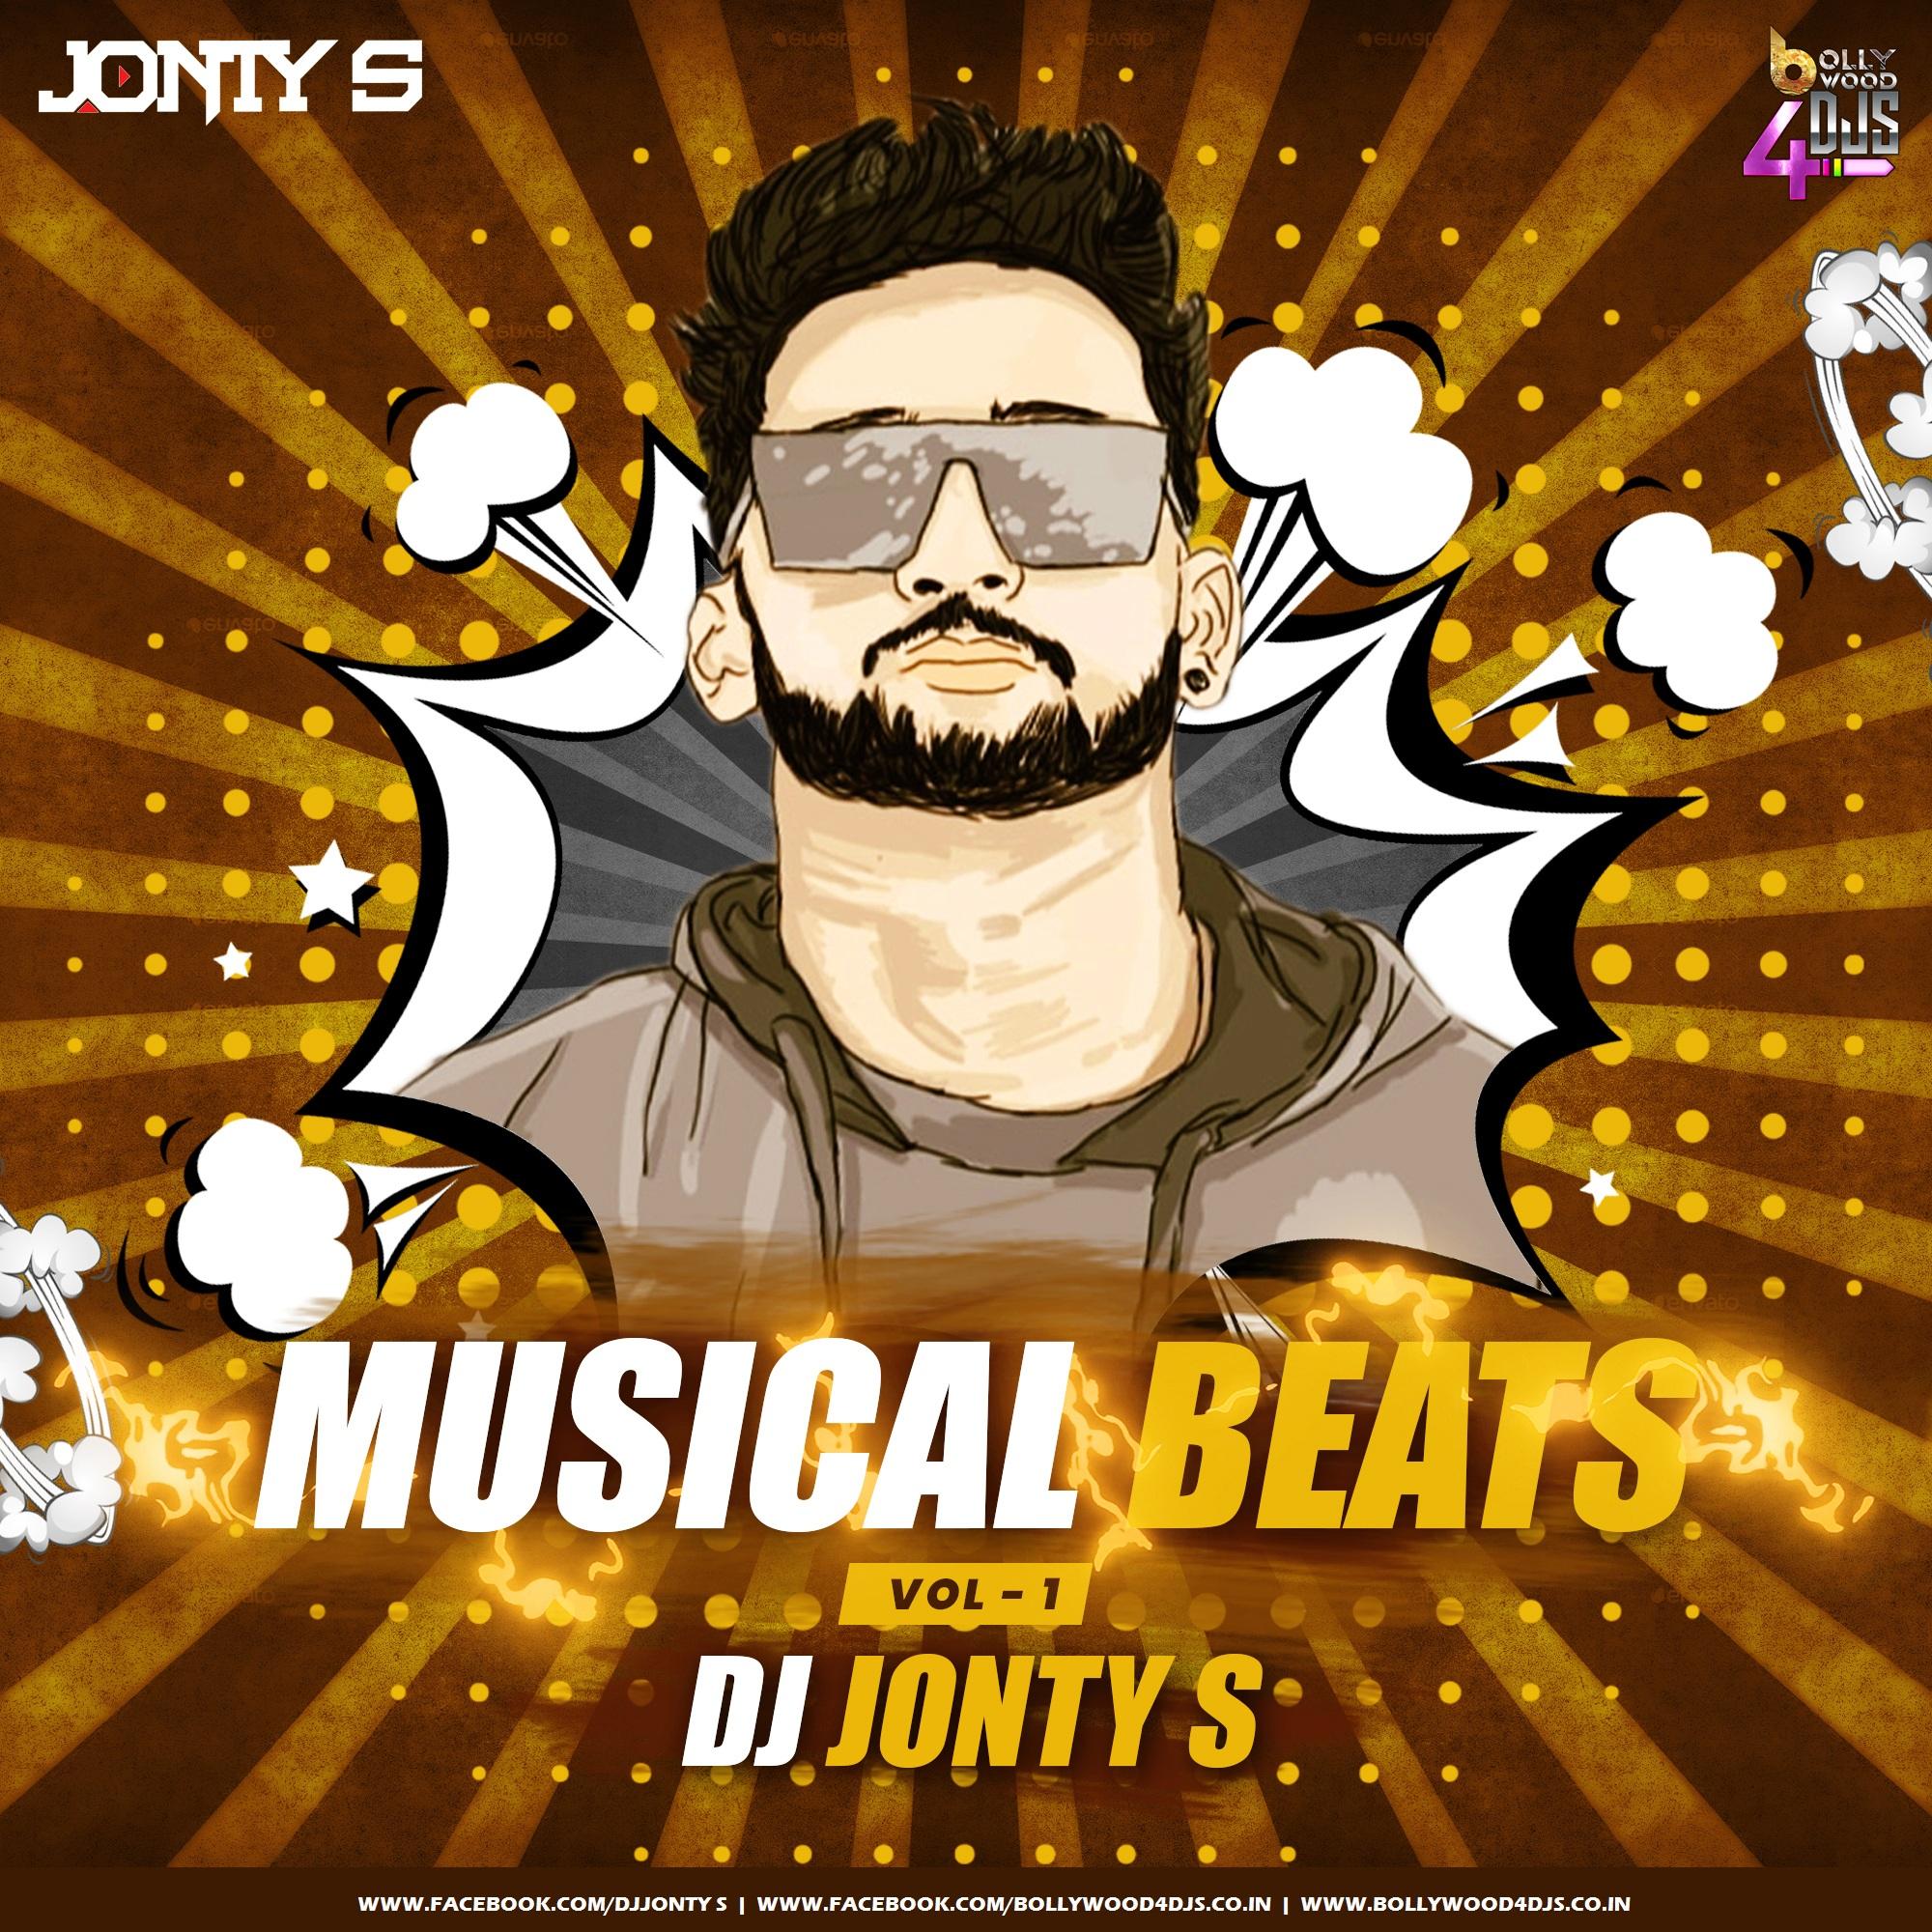 Musical Beatz Vol.1 DJ JONTY S